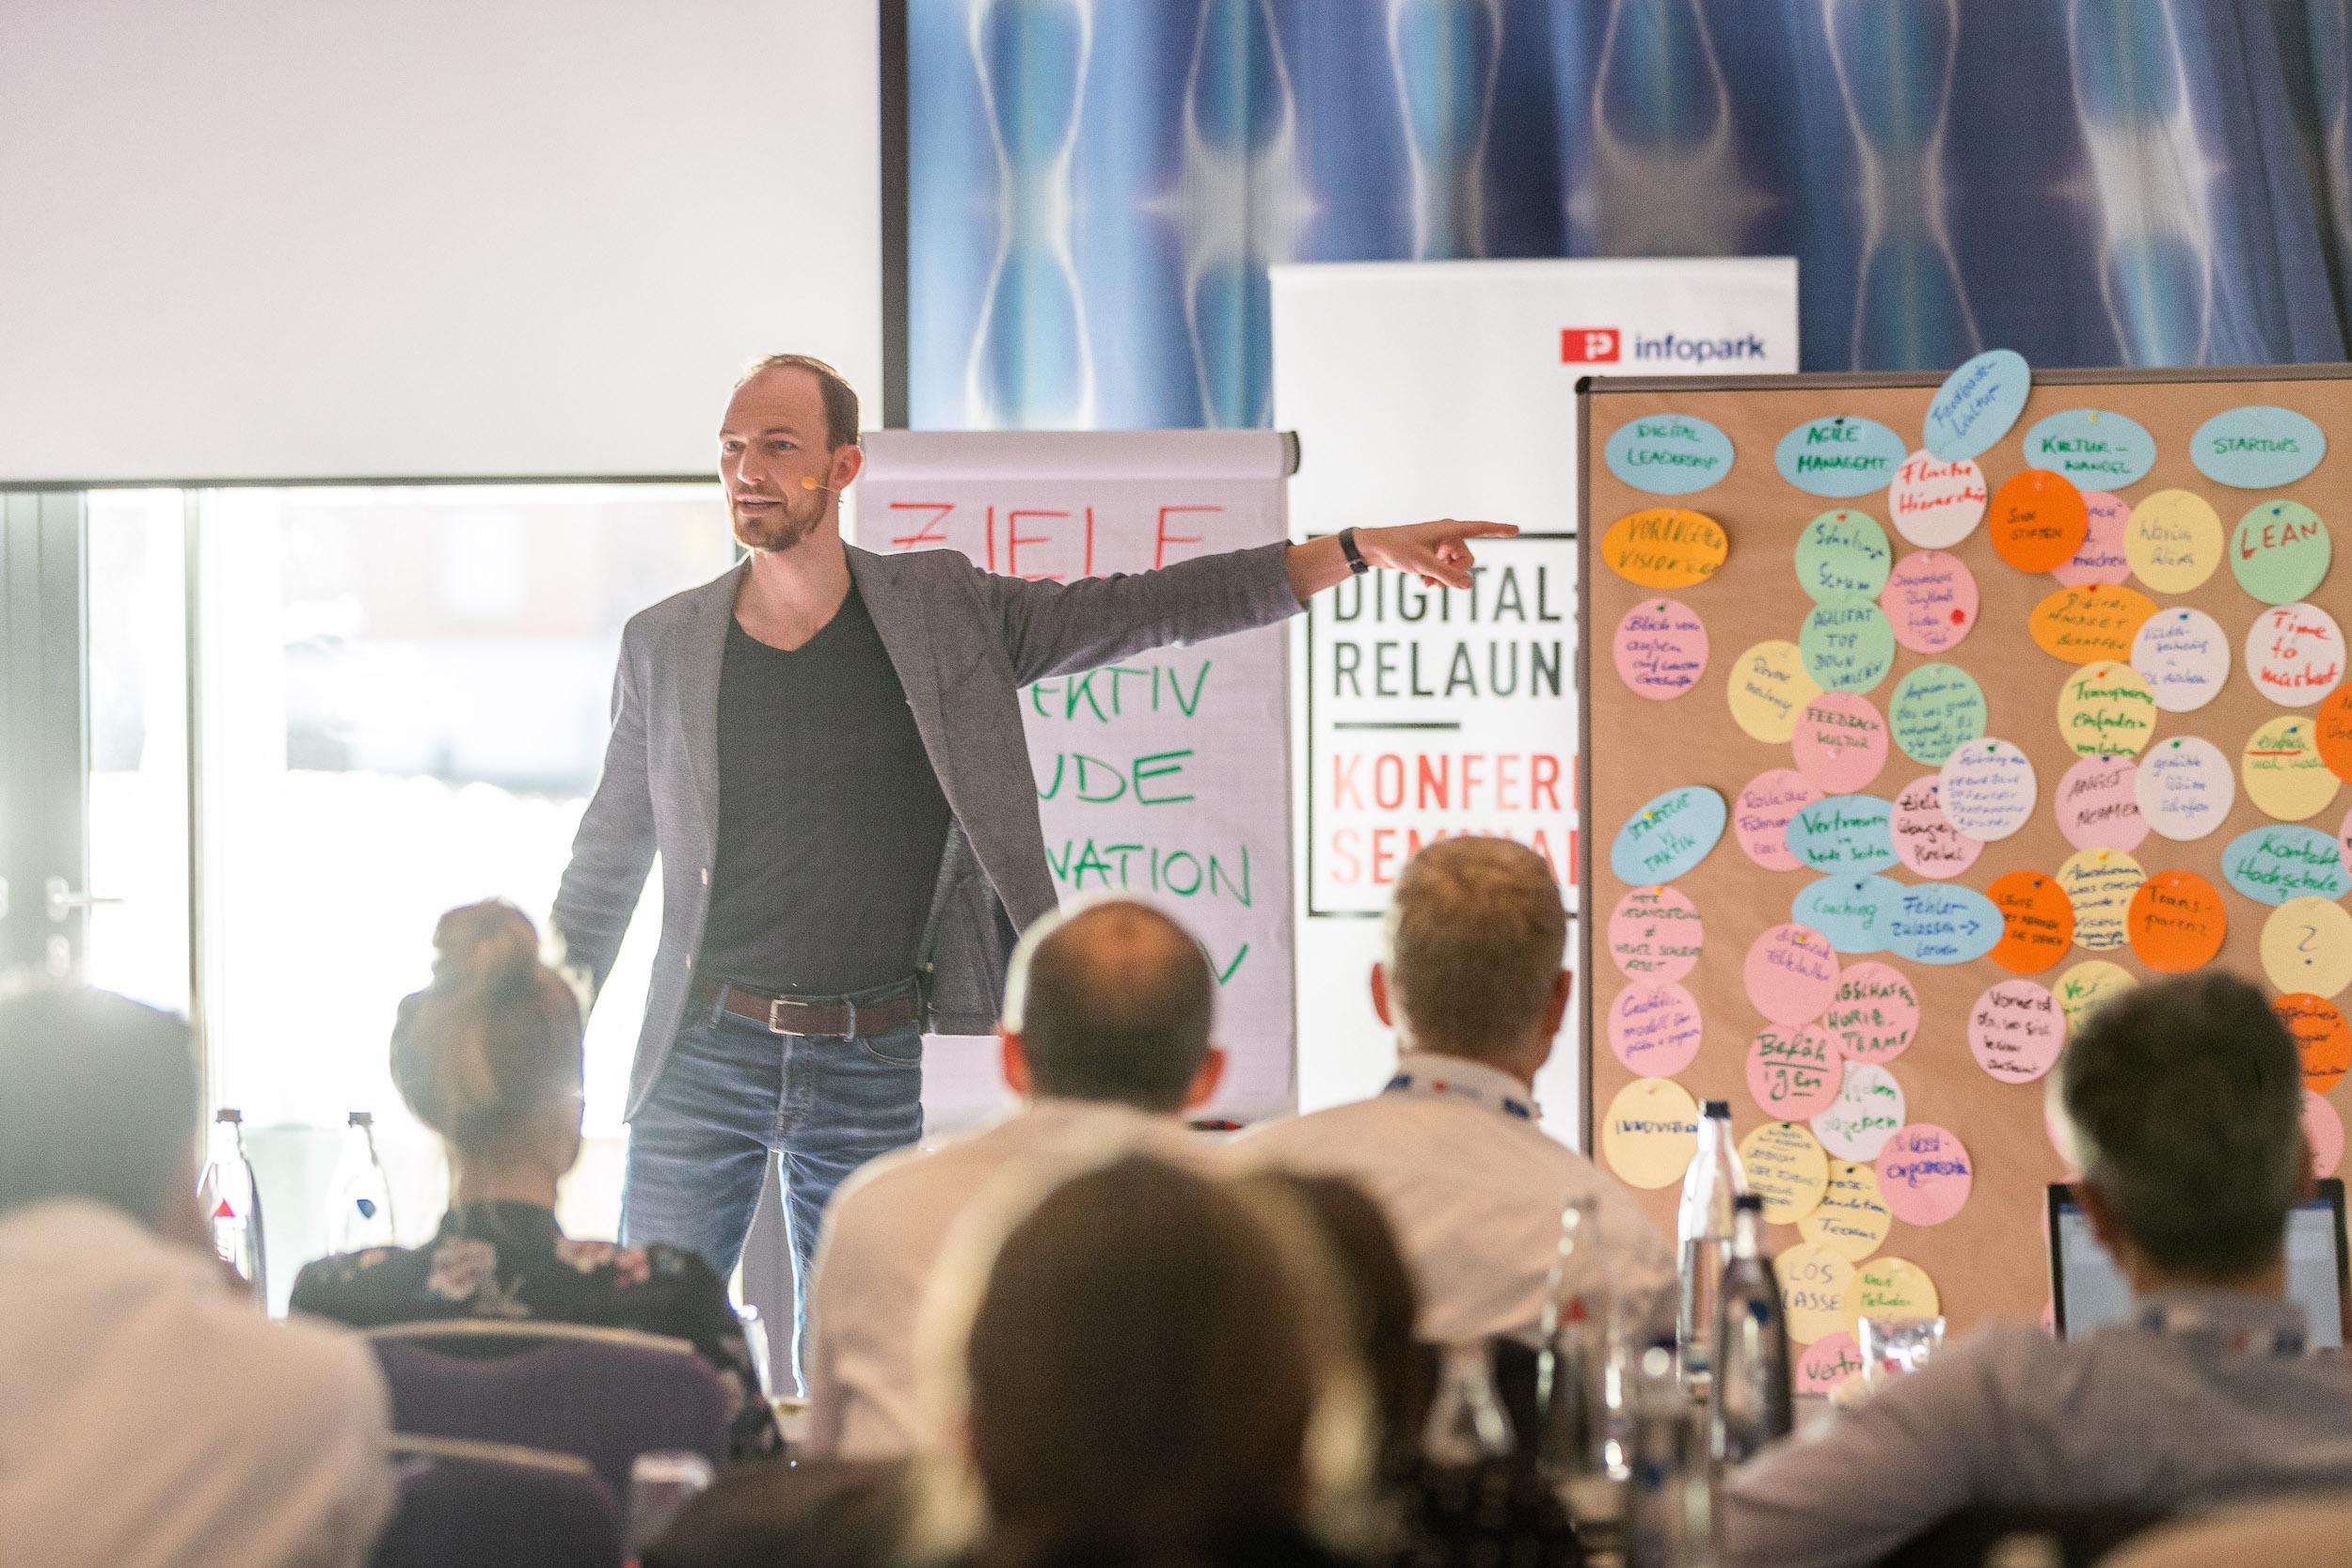 Alex T. Steffen Seminar Infopark Leadership